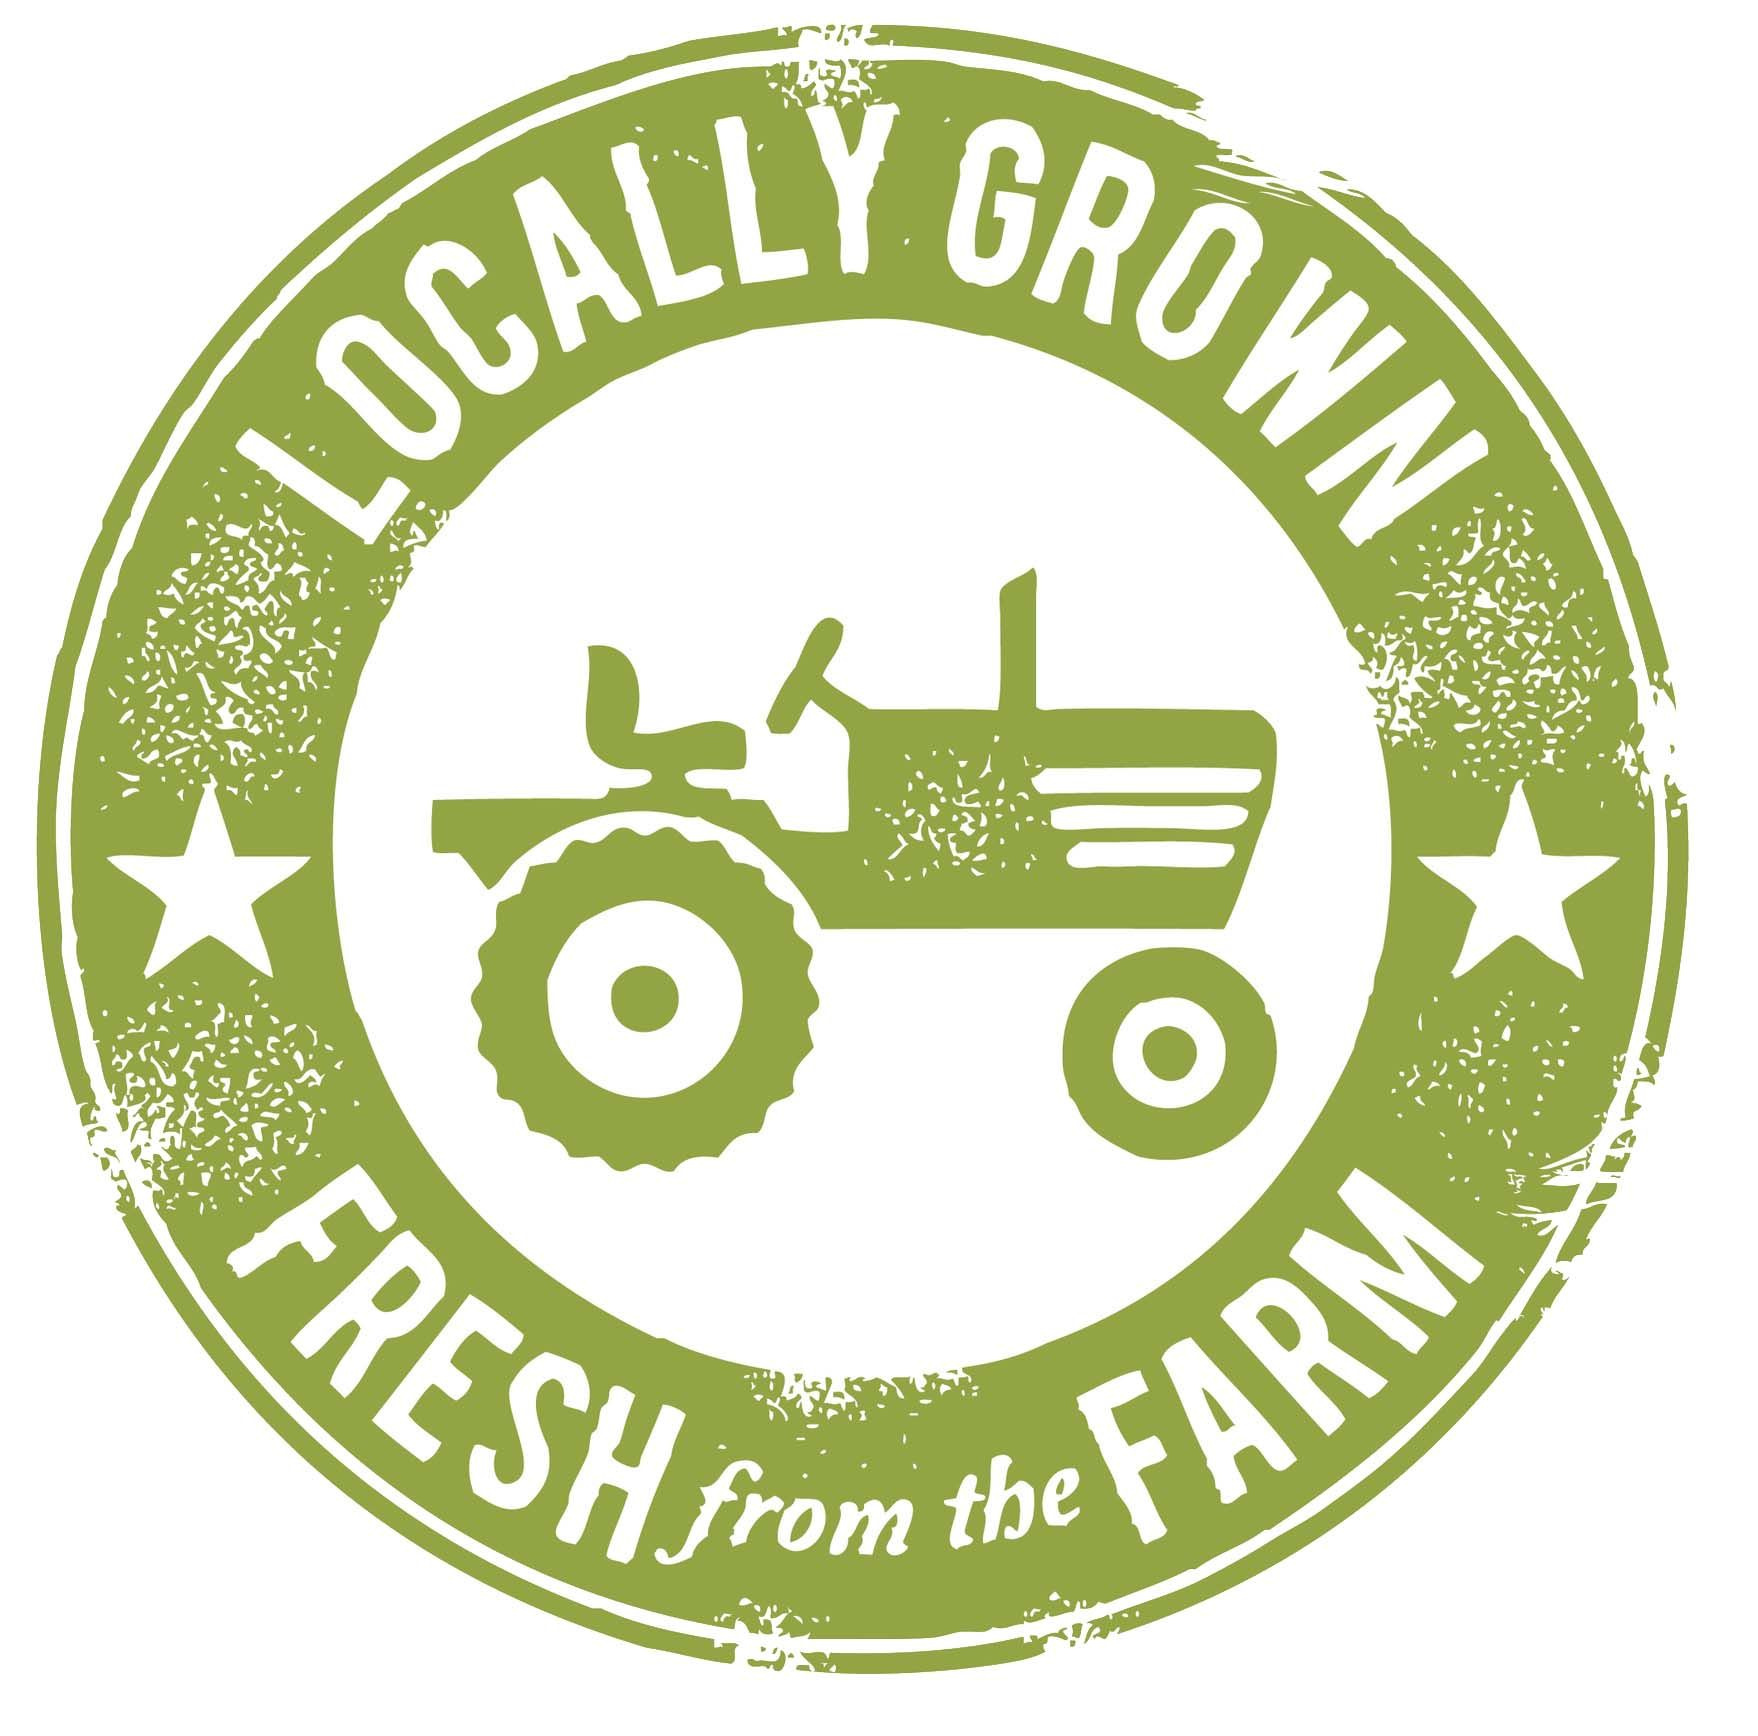 locally grown logo.jpg